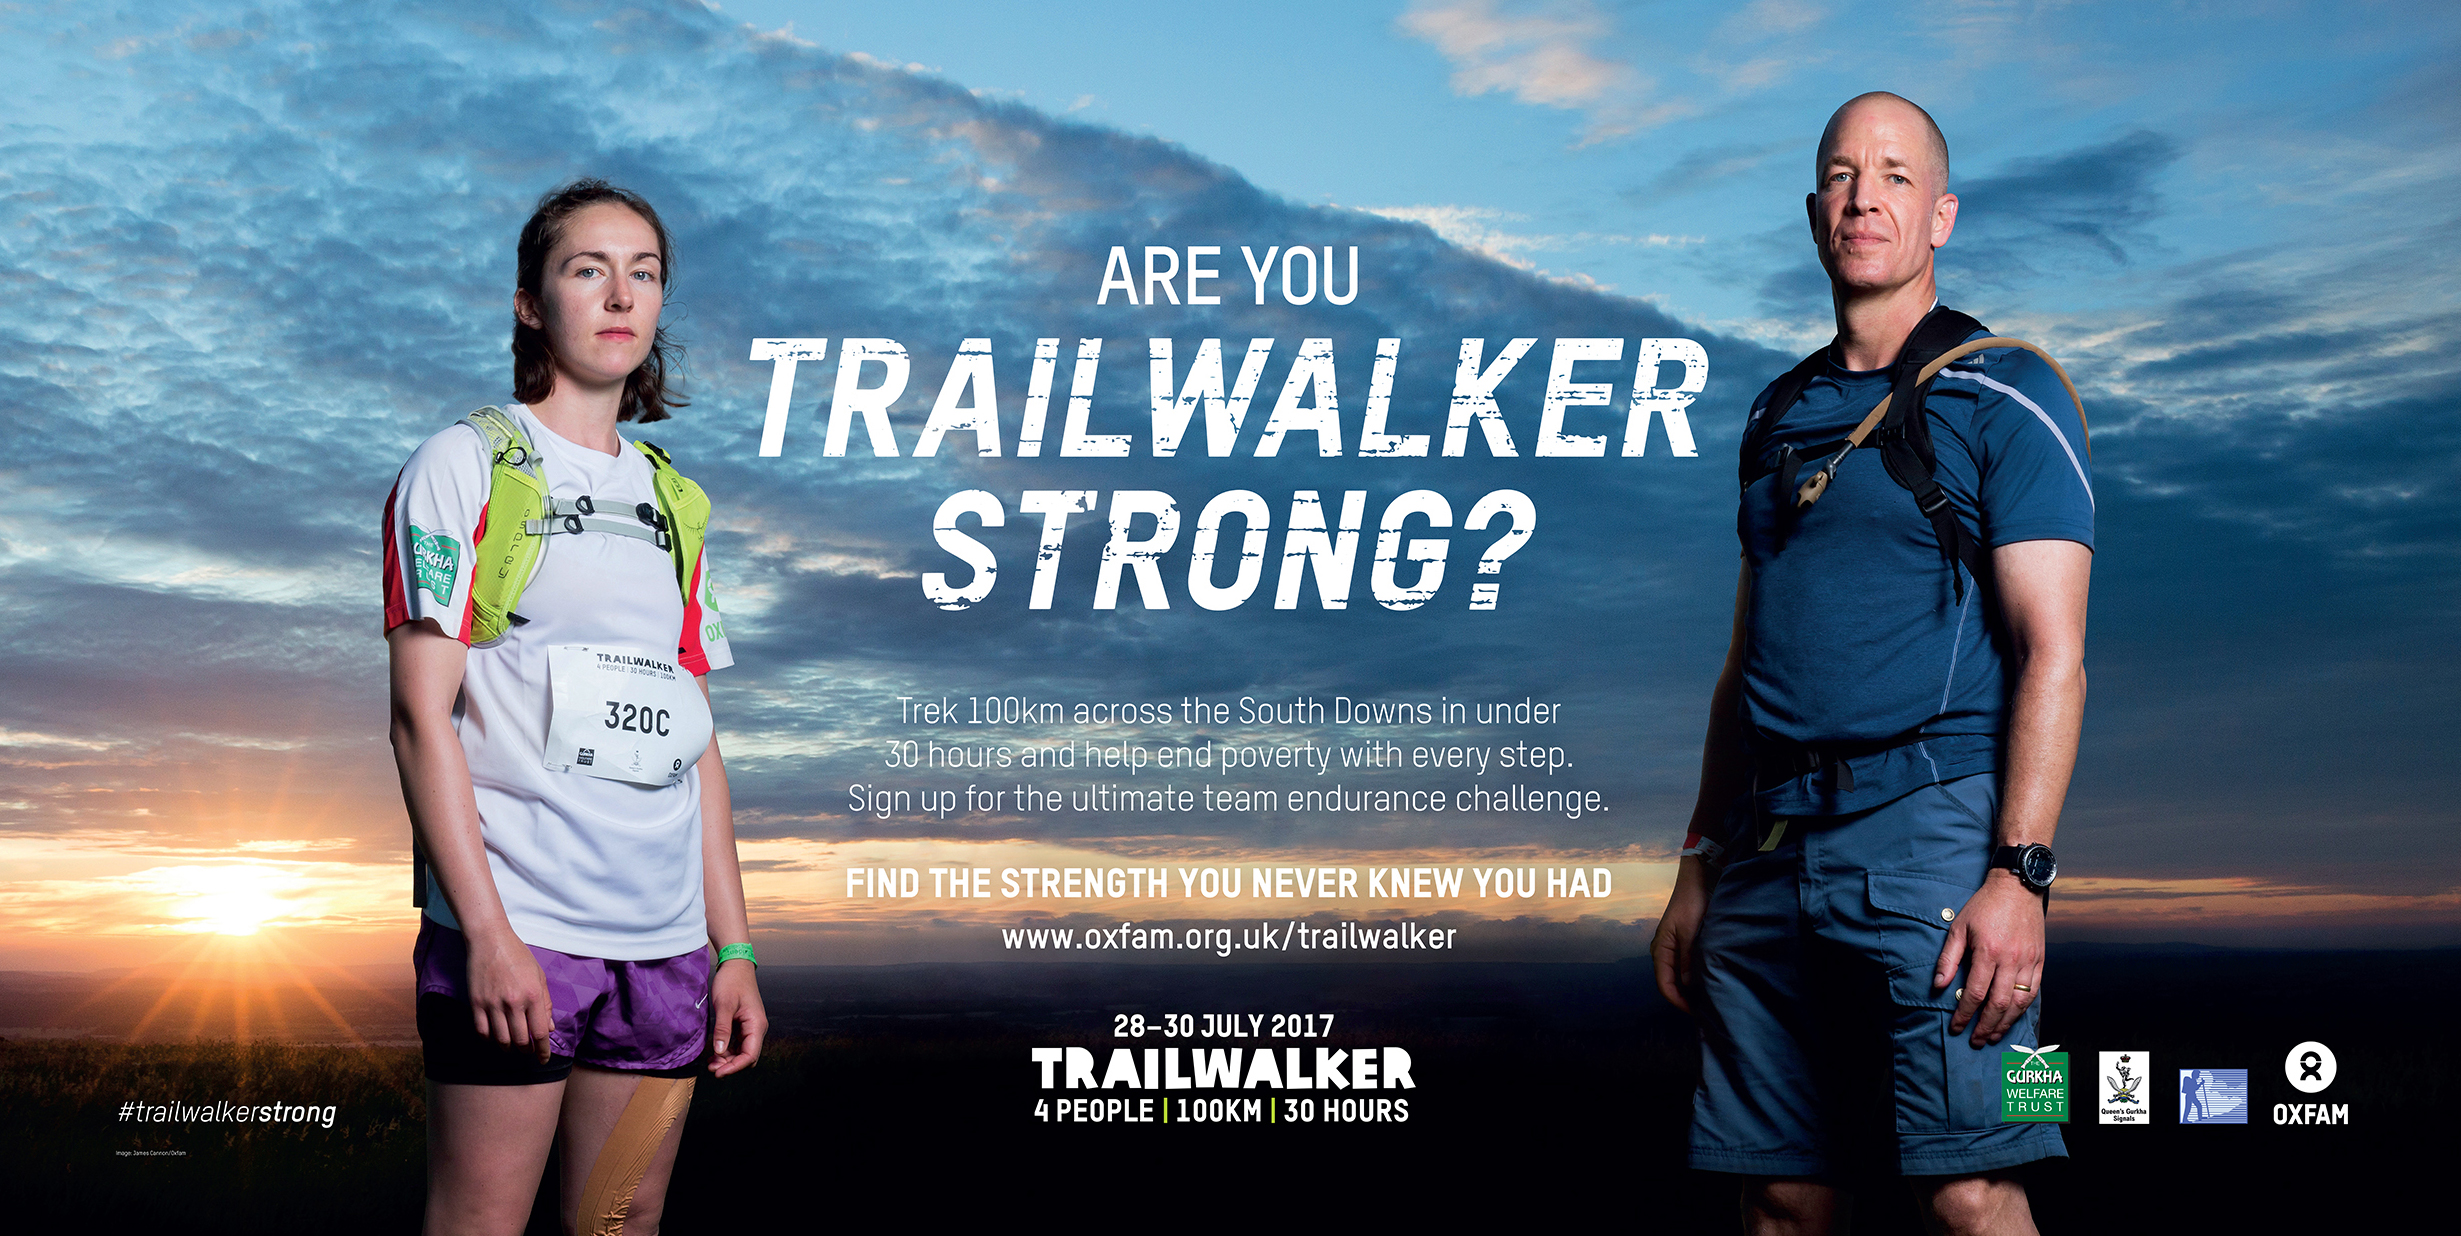 Social_7179_Trailwalker_12_Sheet_762mm_x_381mm.jpg